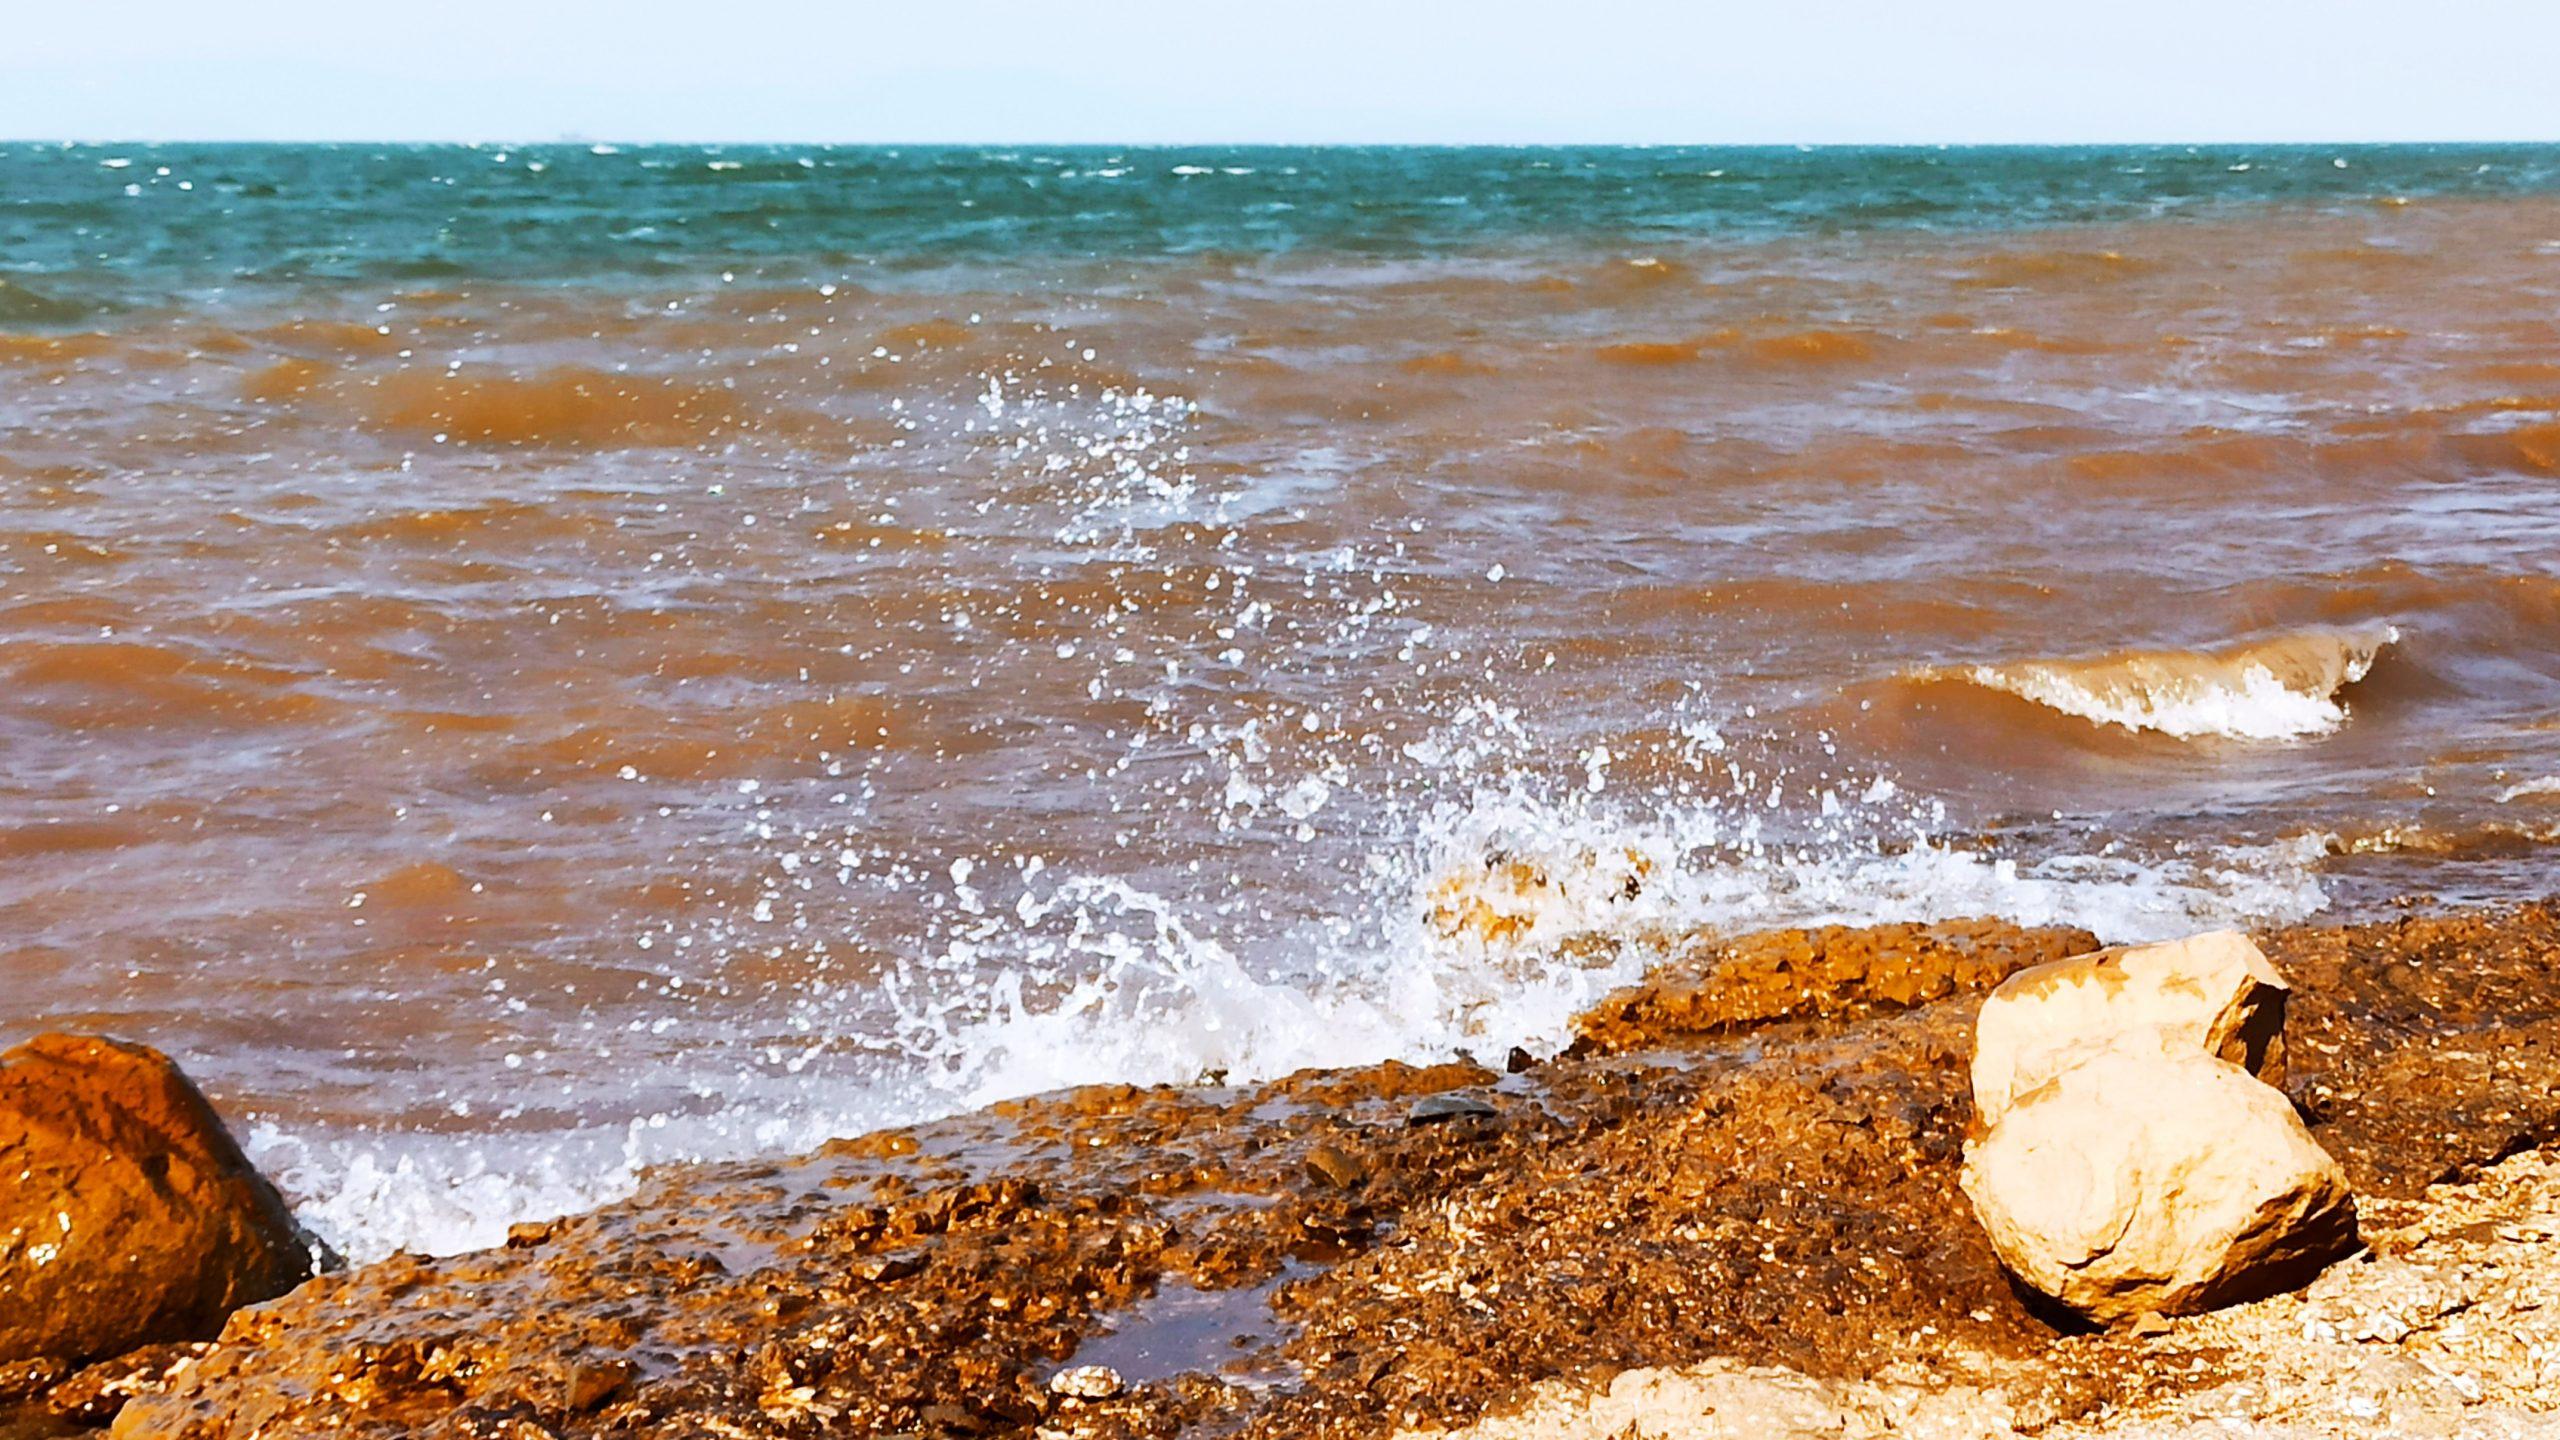 Sea waves reaching the shore